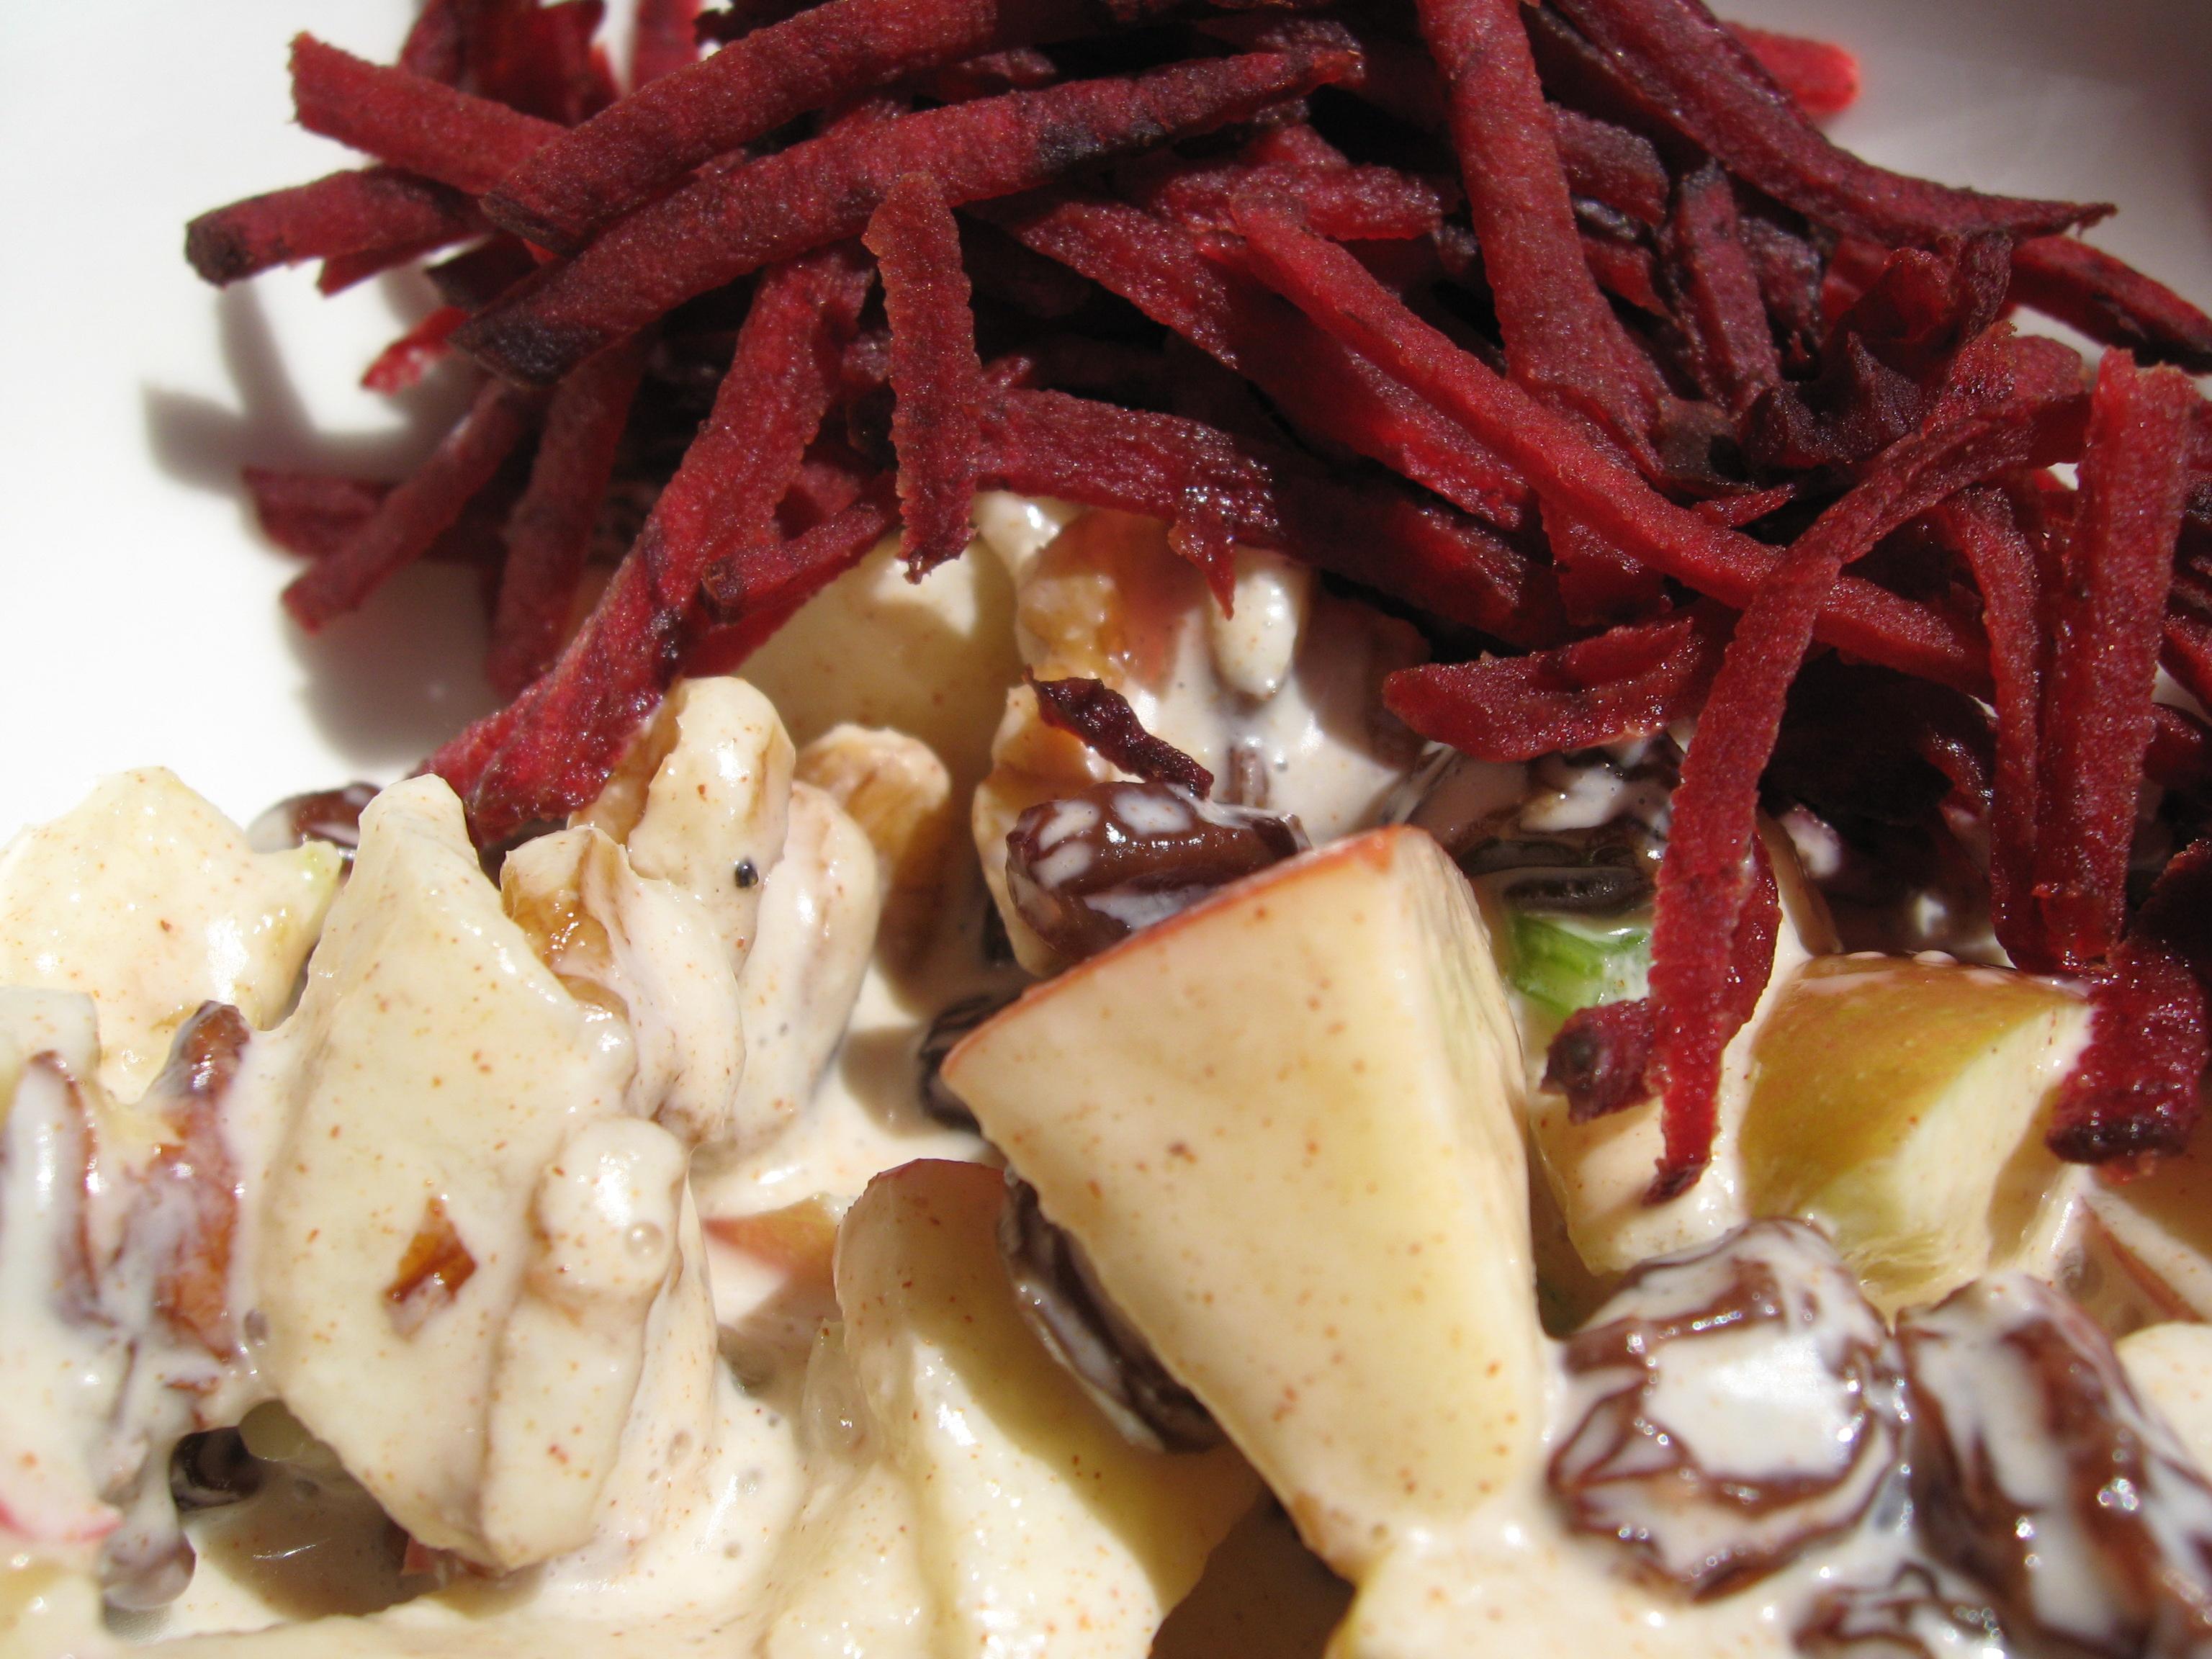 Beets and a cinnamon apple salad.